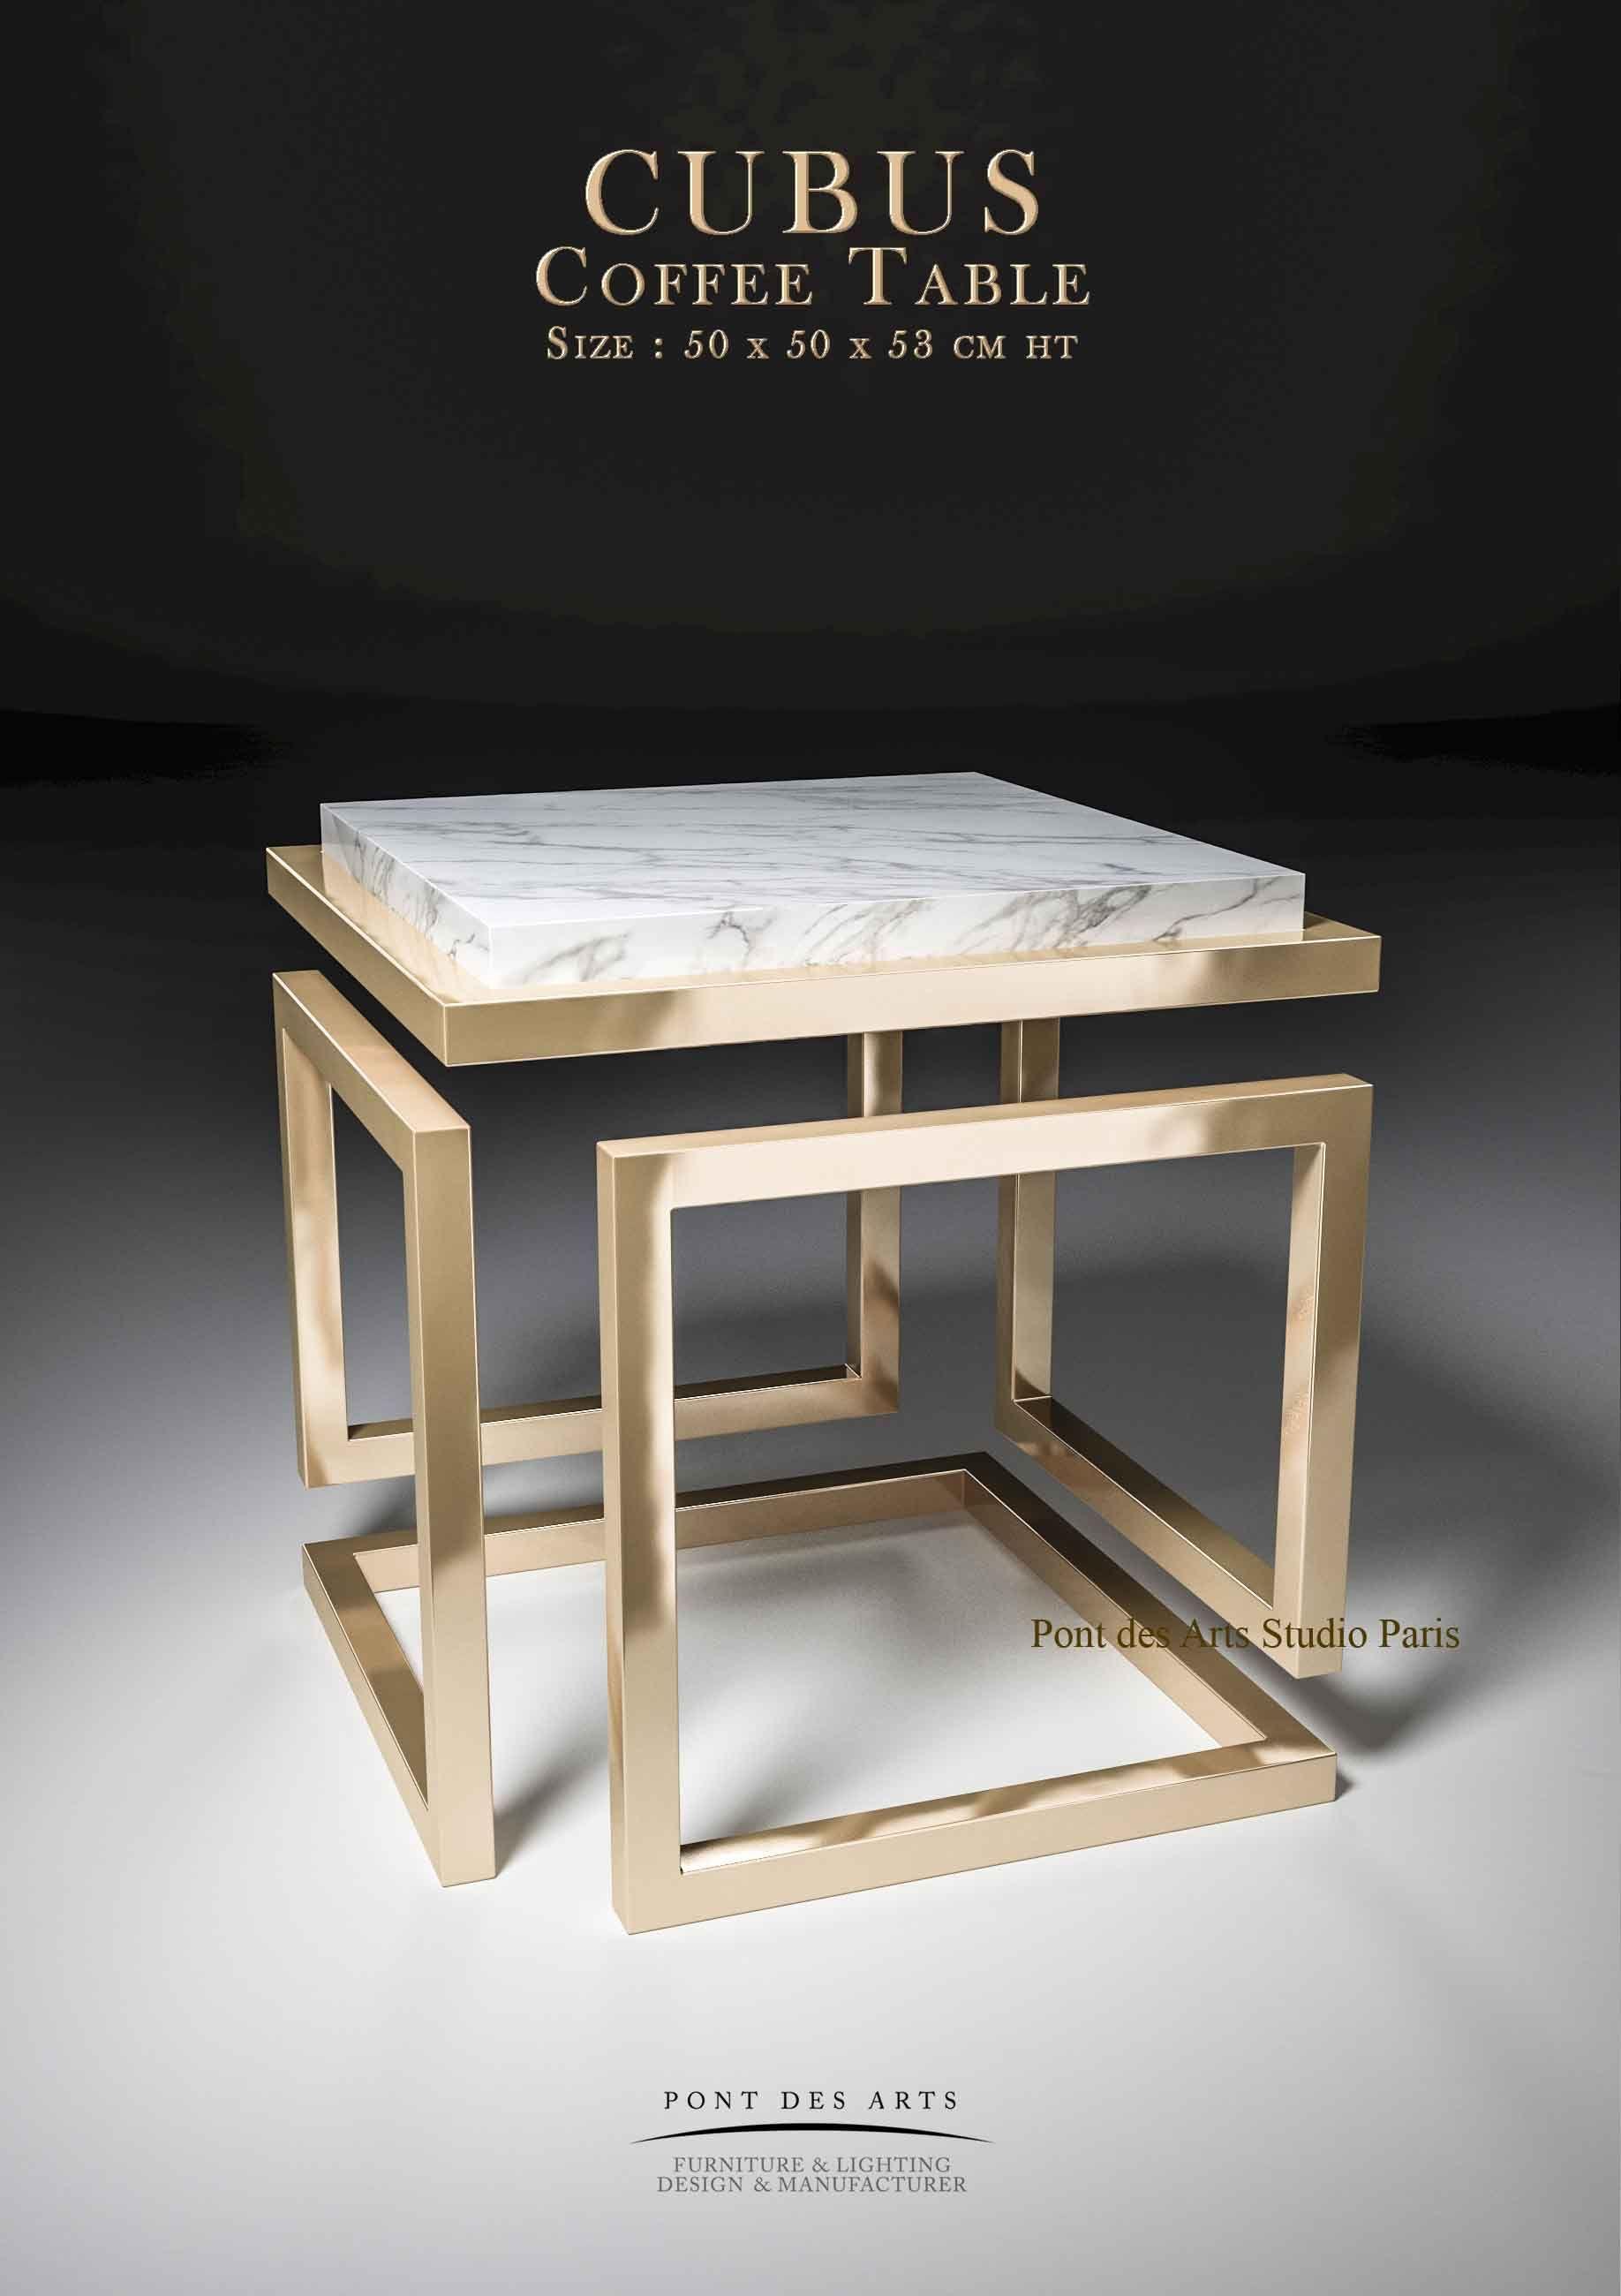 40 Creative Diy Coffee Table Ideas You Can Build Yourself Diy